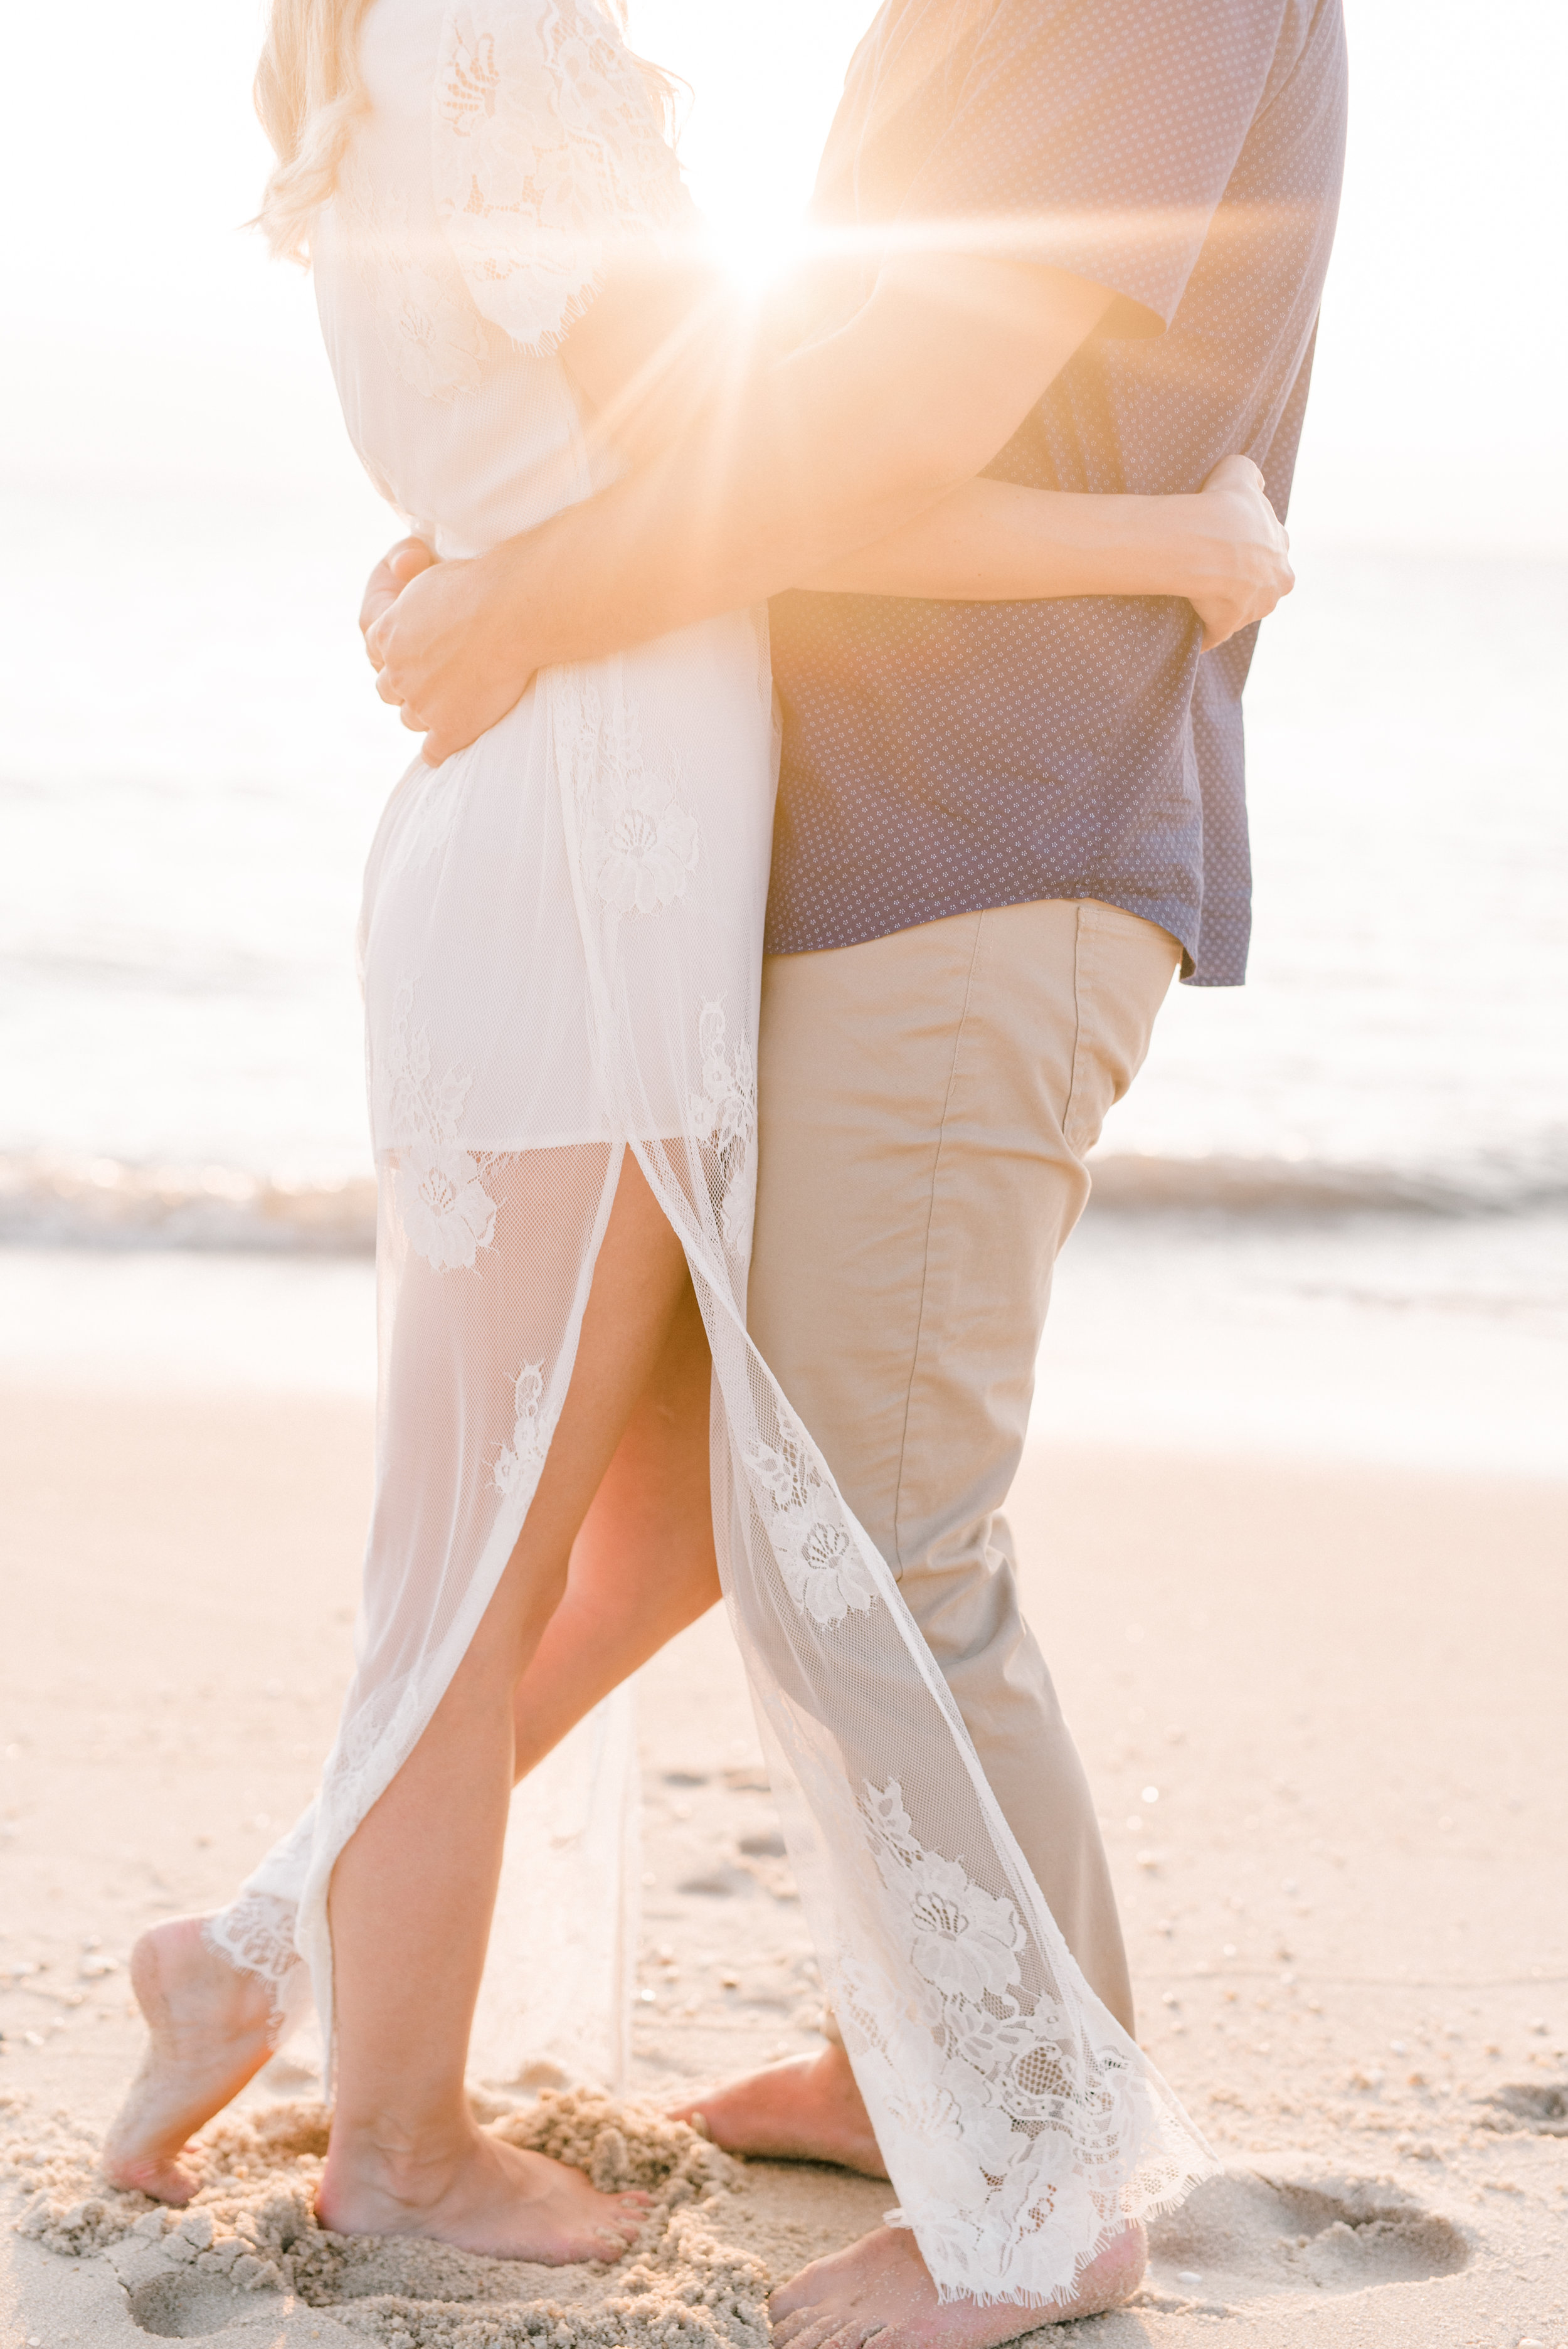 cape-may-beach-engagement-photos-haley-richter-photography-045.jpg